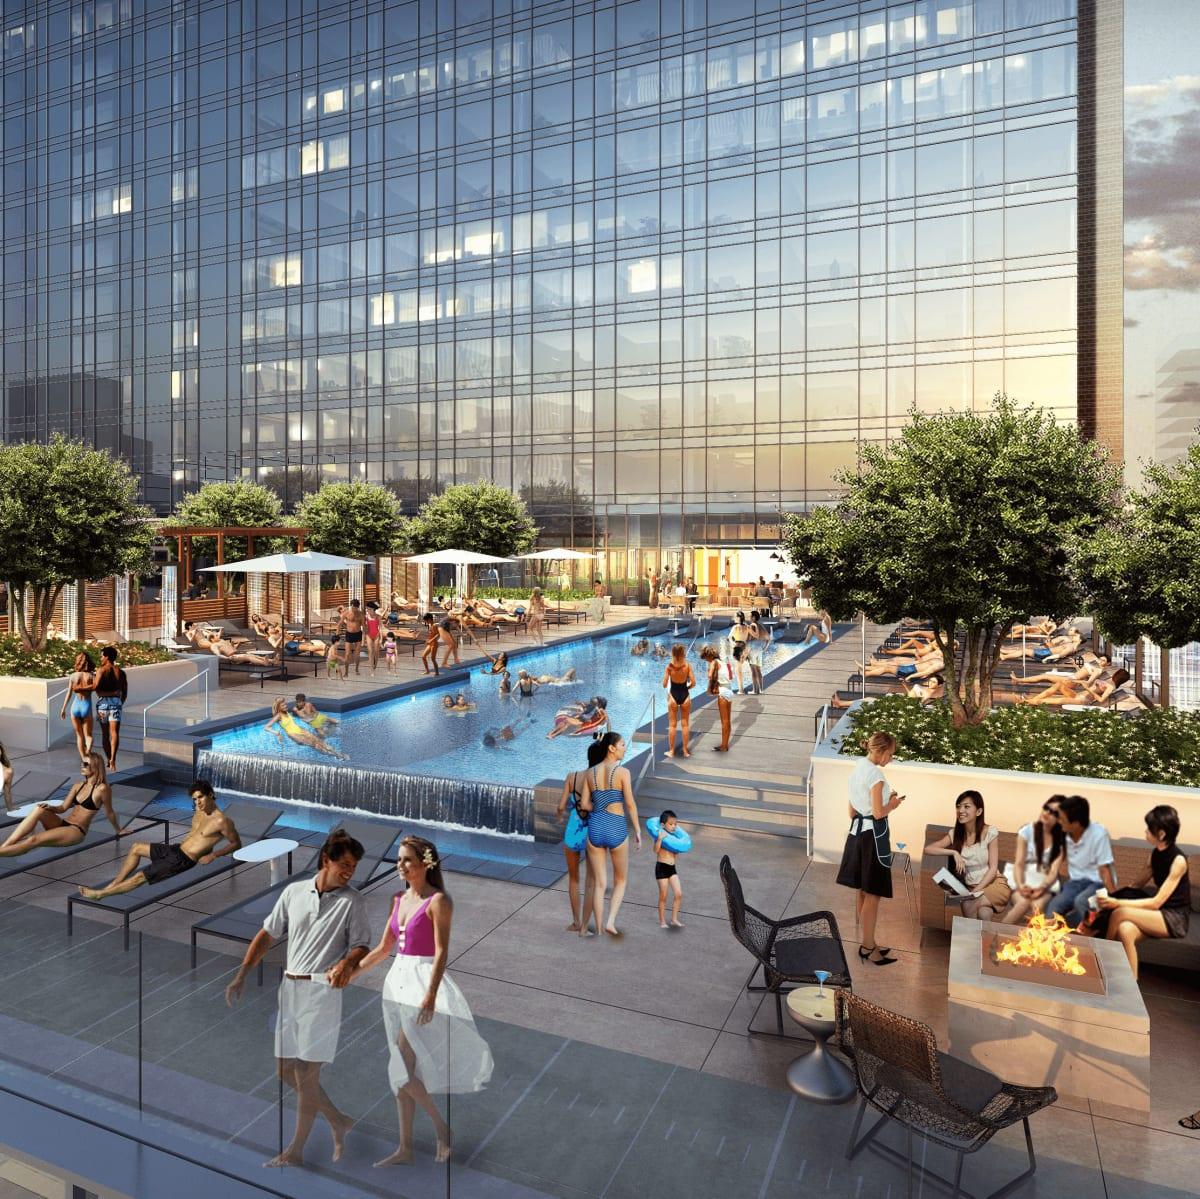 Omni Frisco hotel pool deck rendering